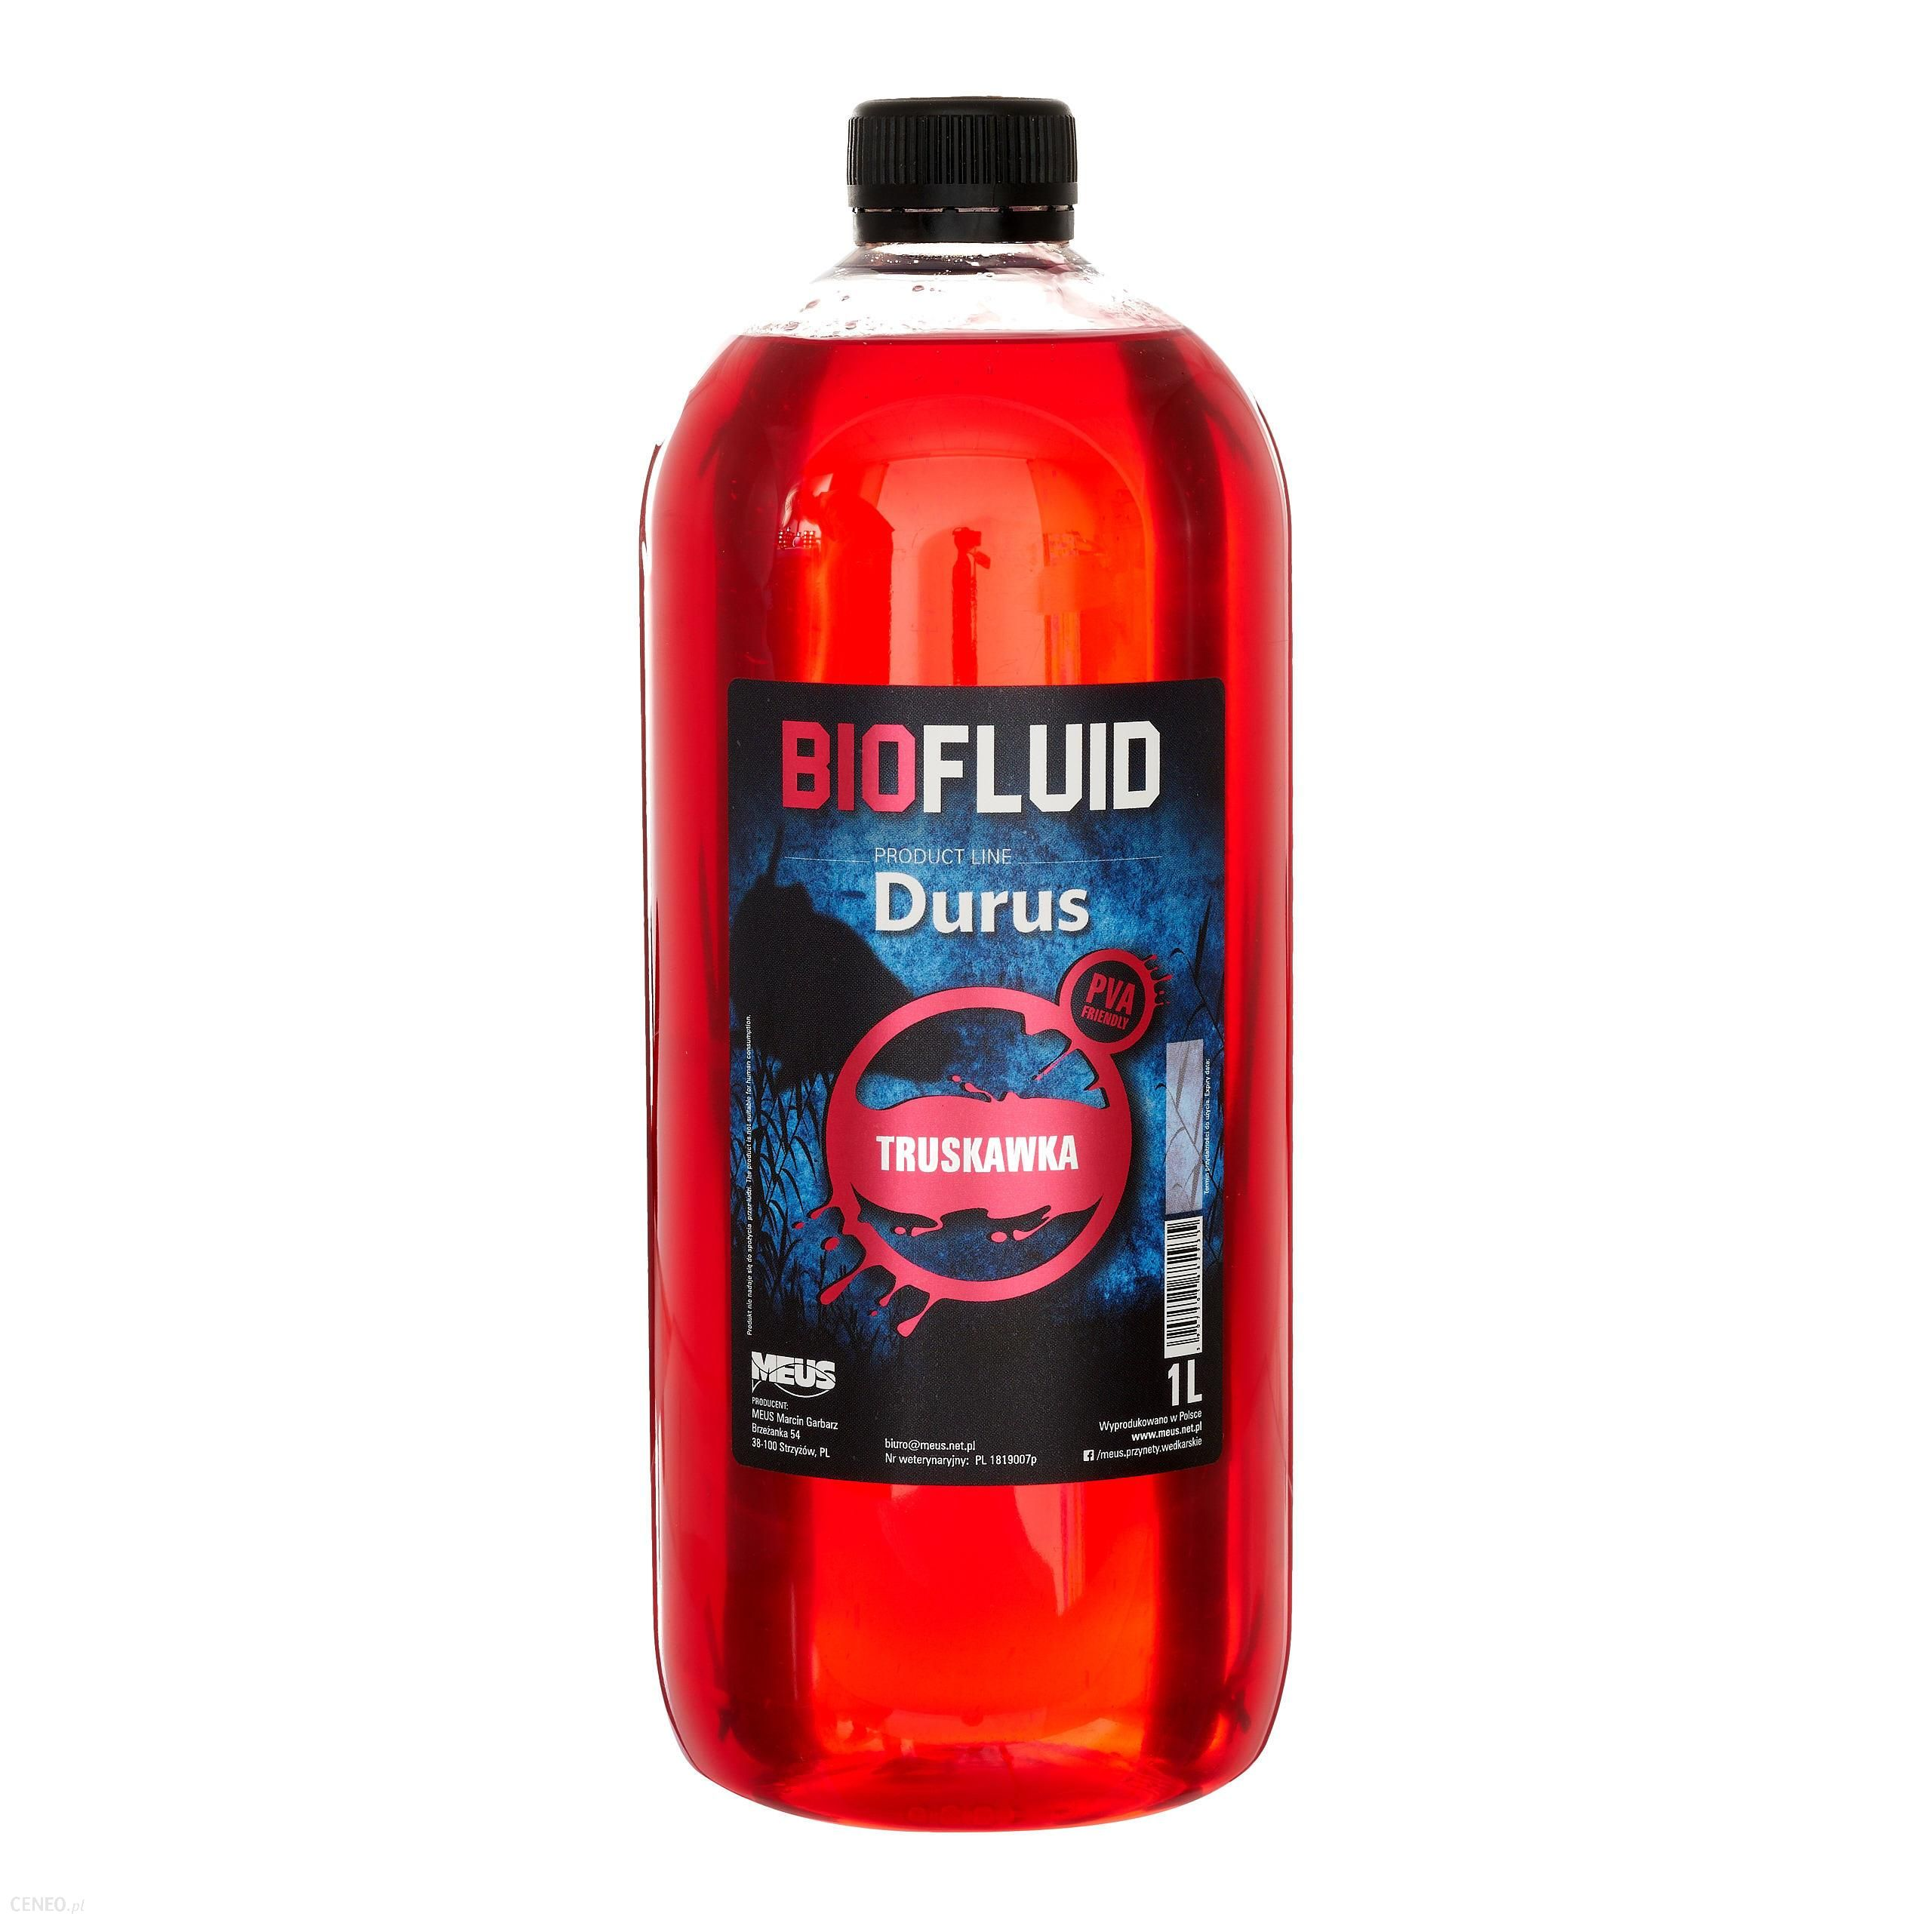 Meus Bio Fluid Spectrum Truskawka